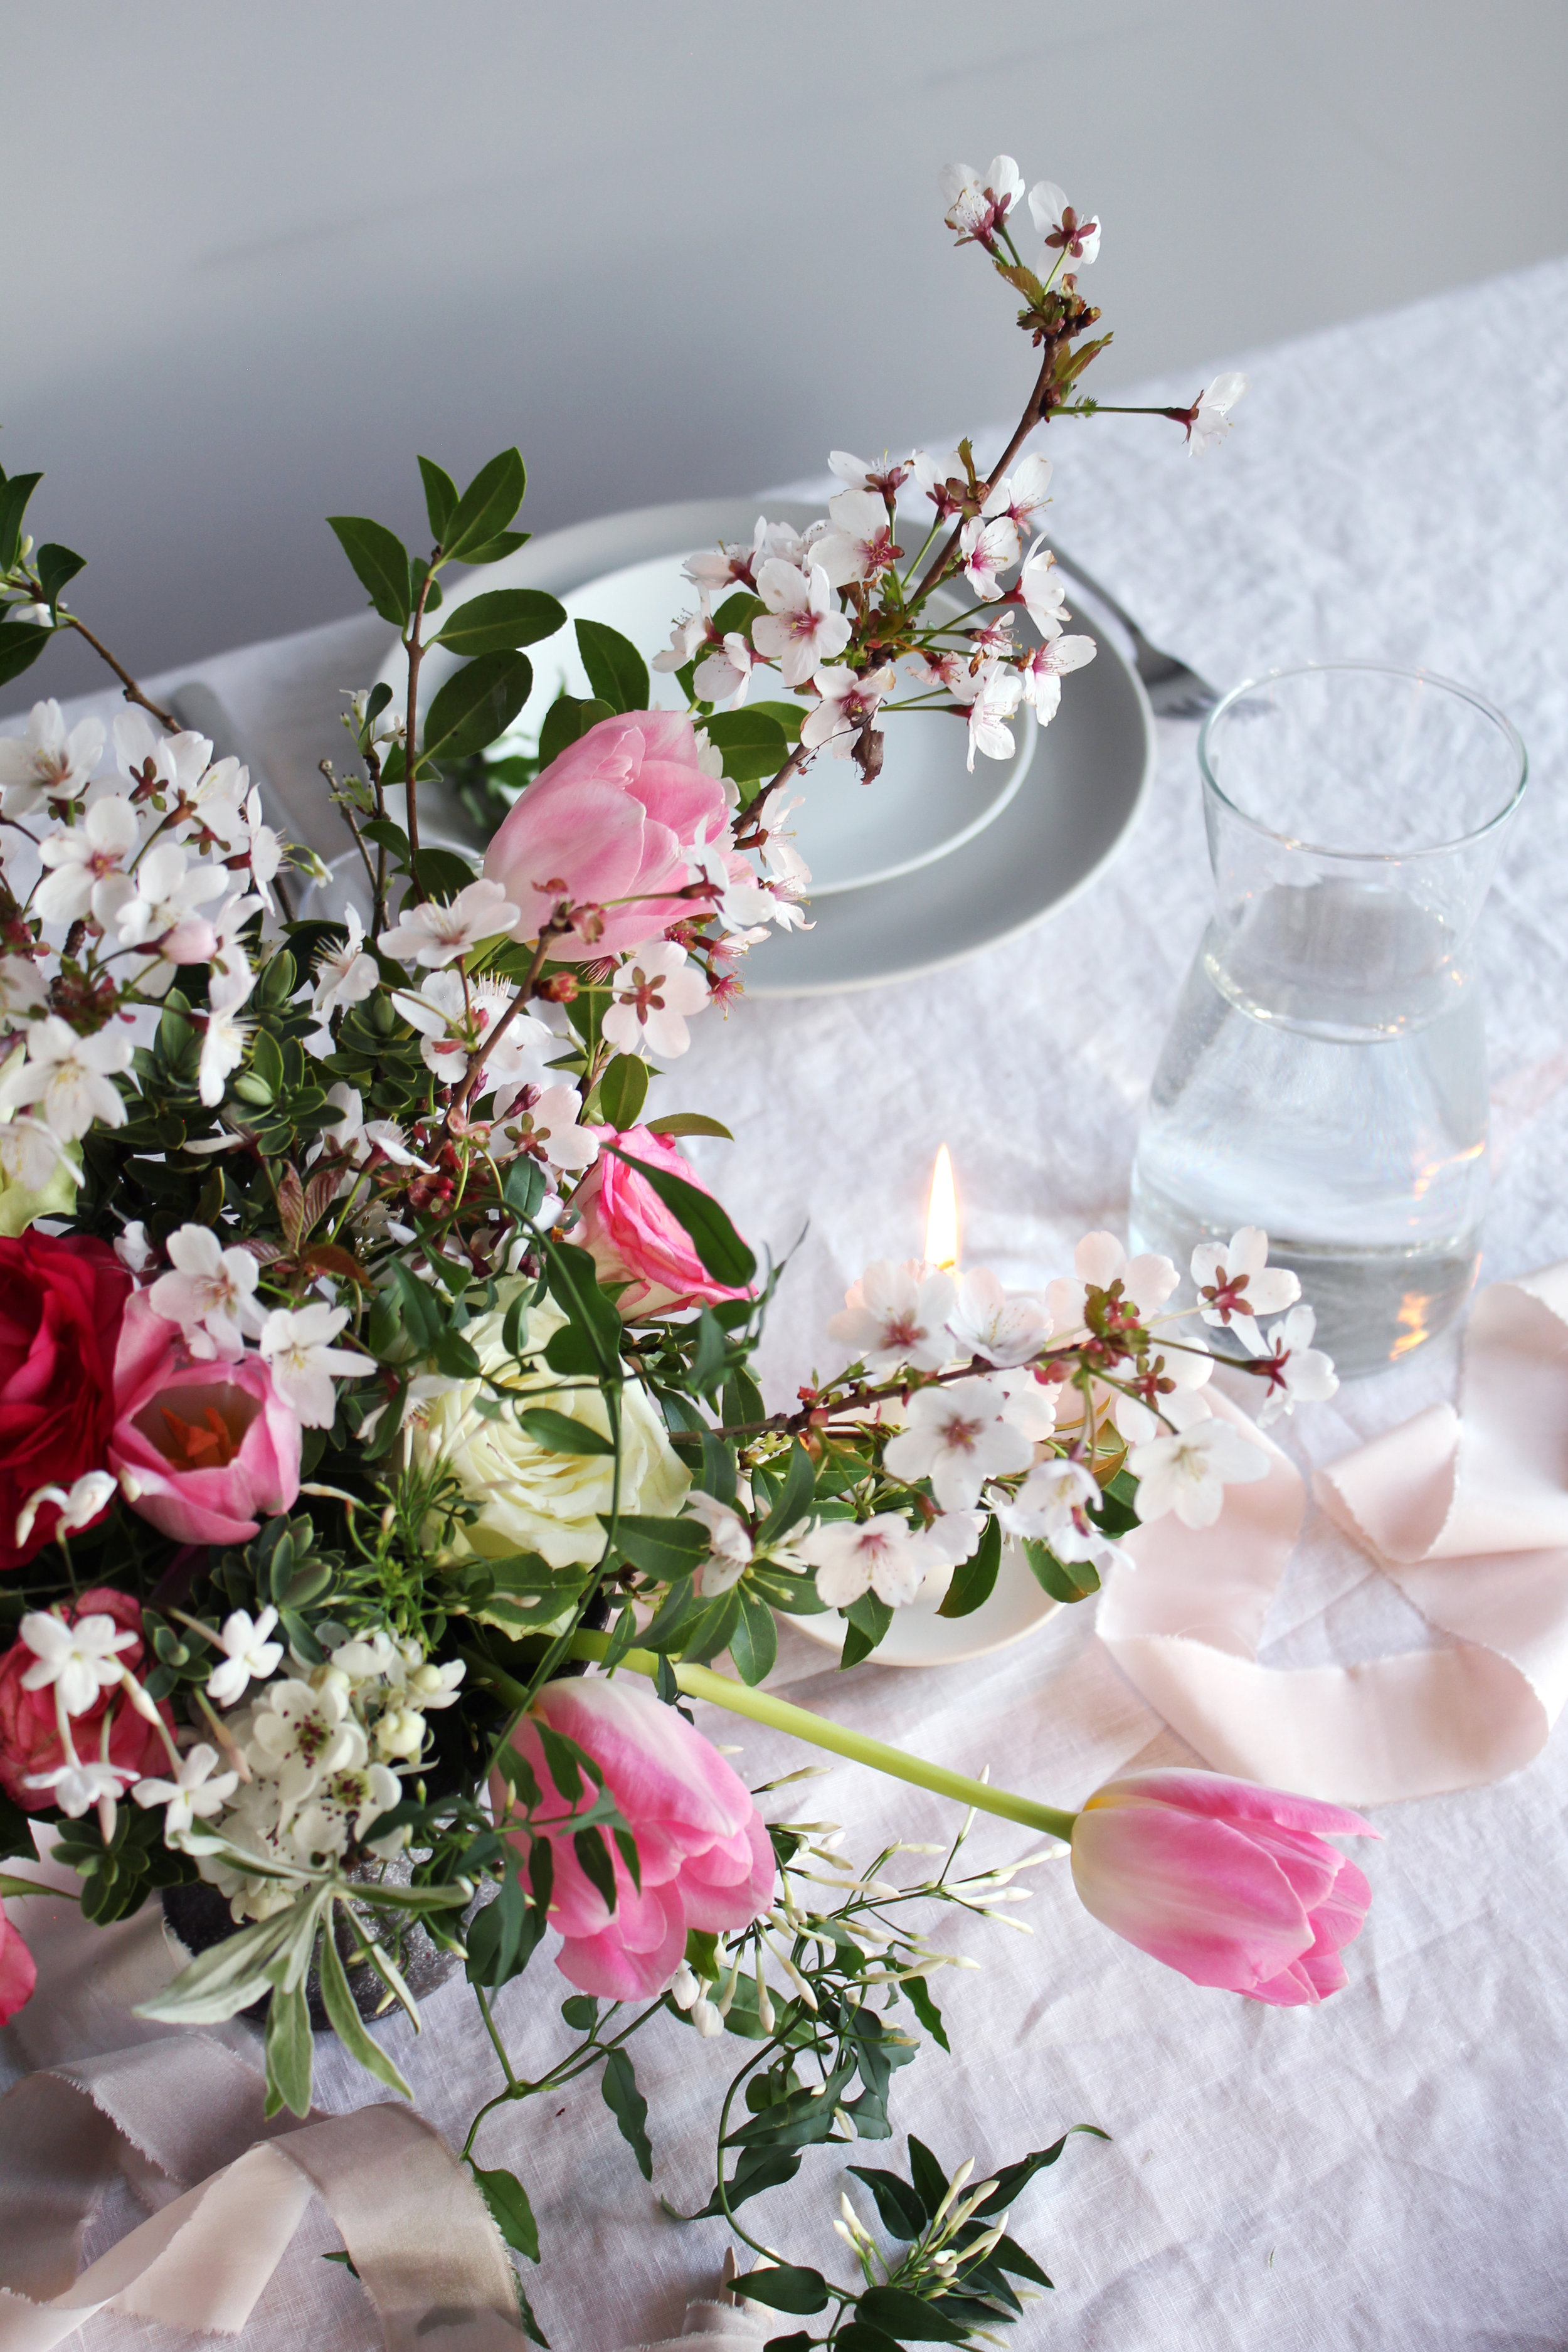 Callie-Pettigrew-Springtime-Wedding-4.jpg